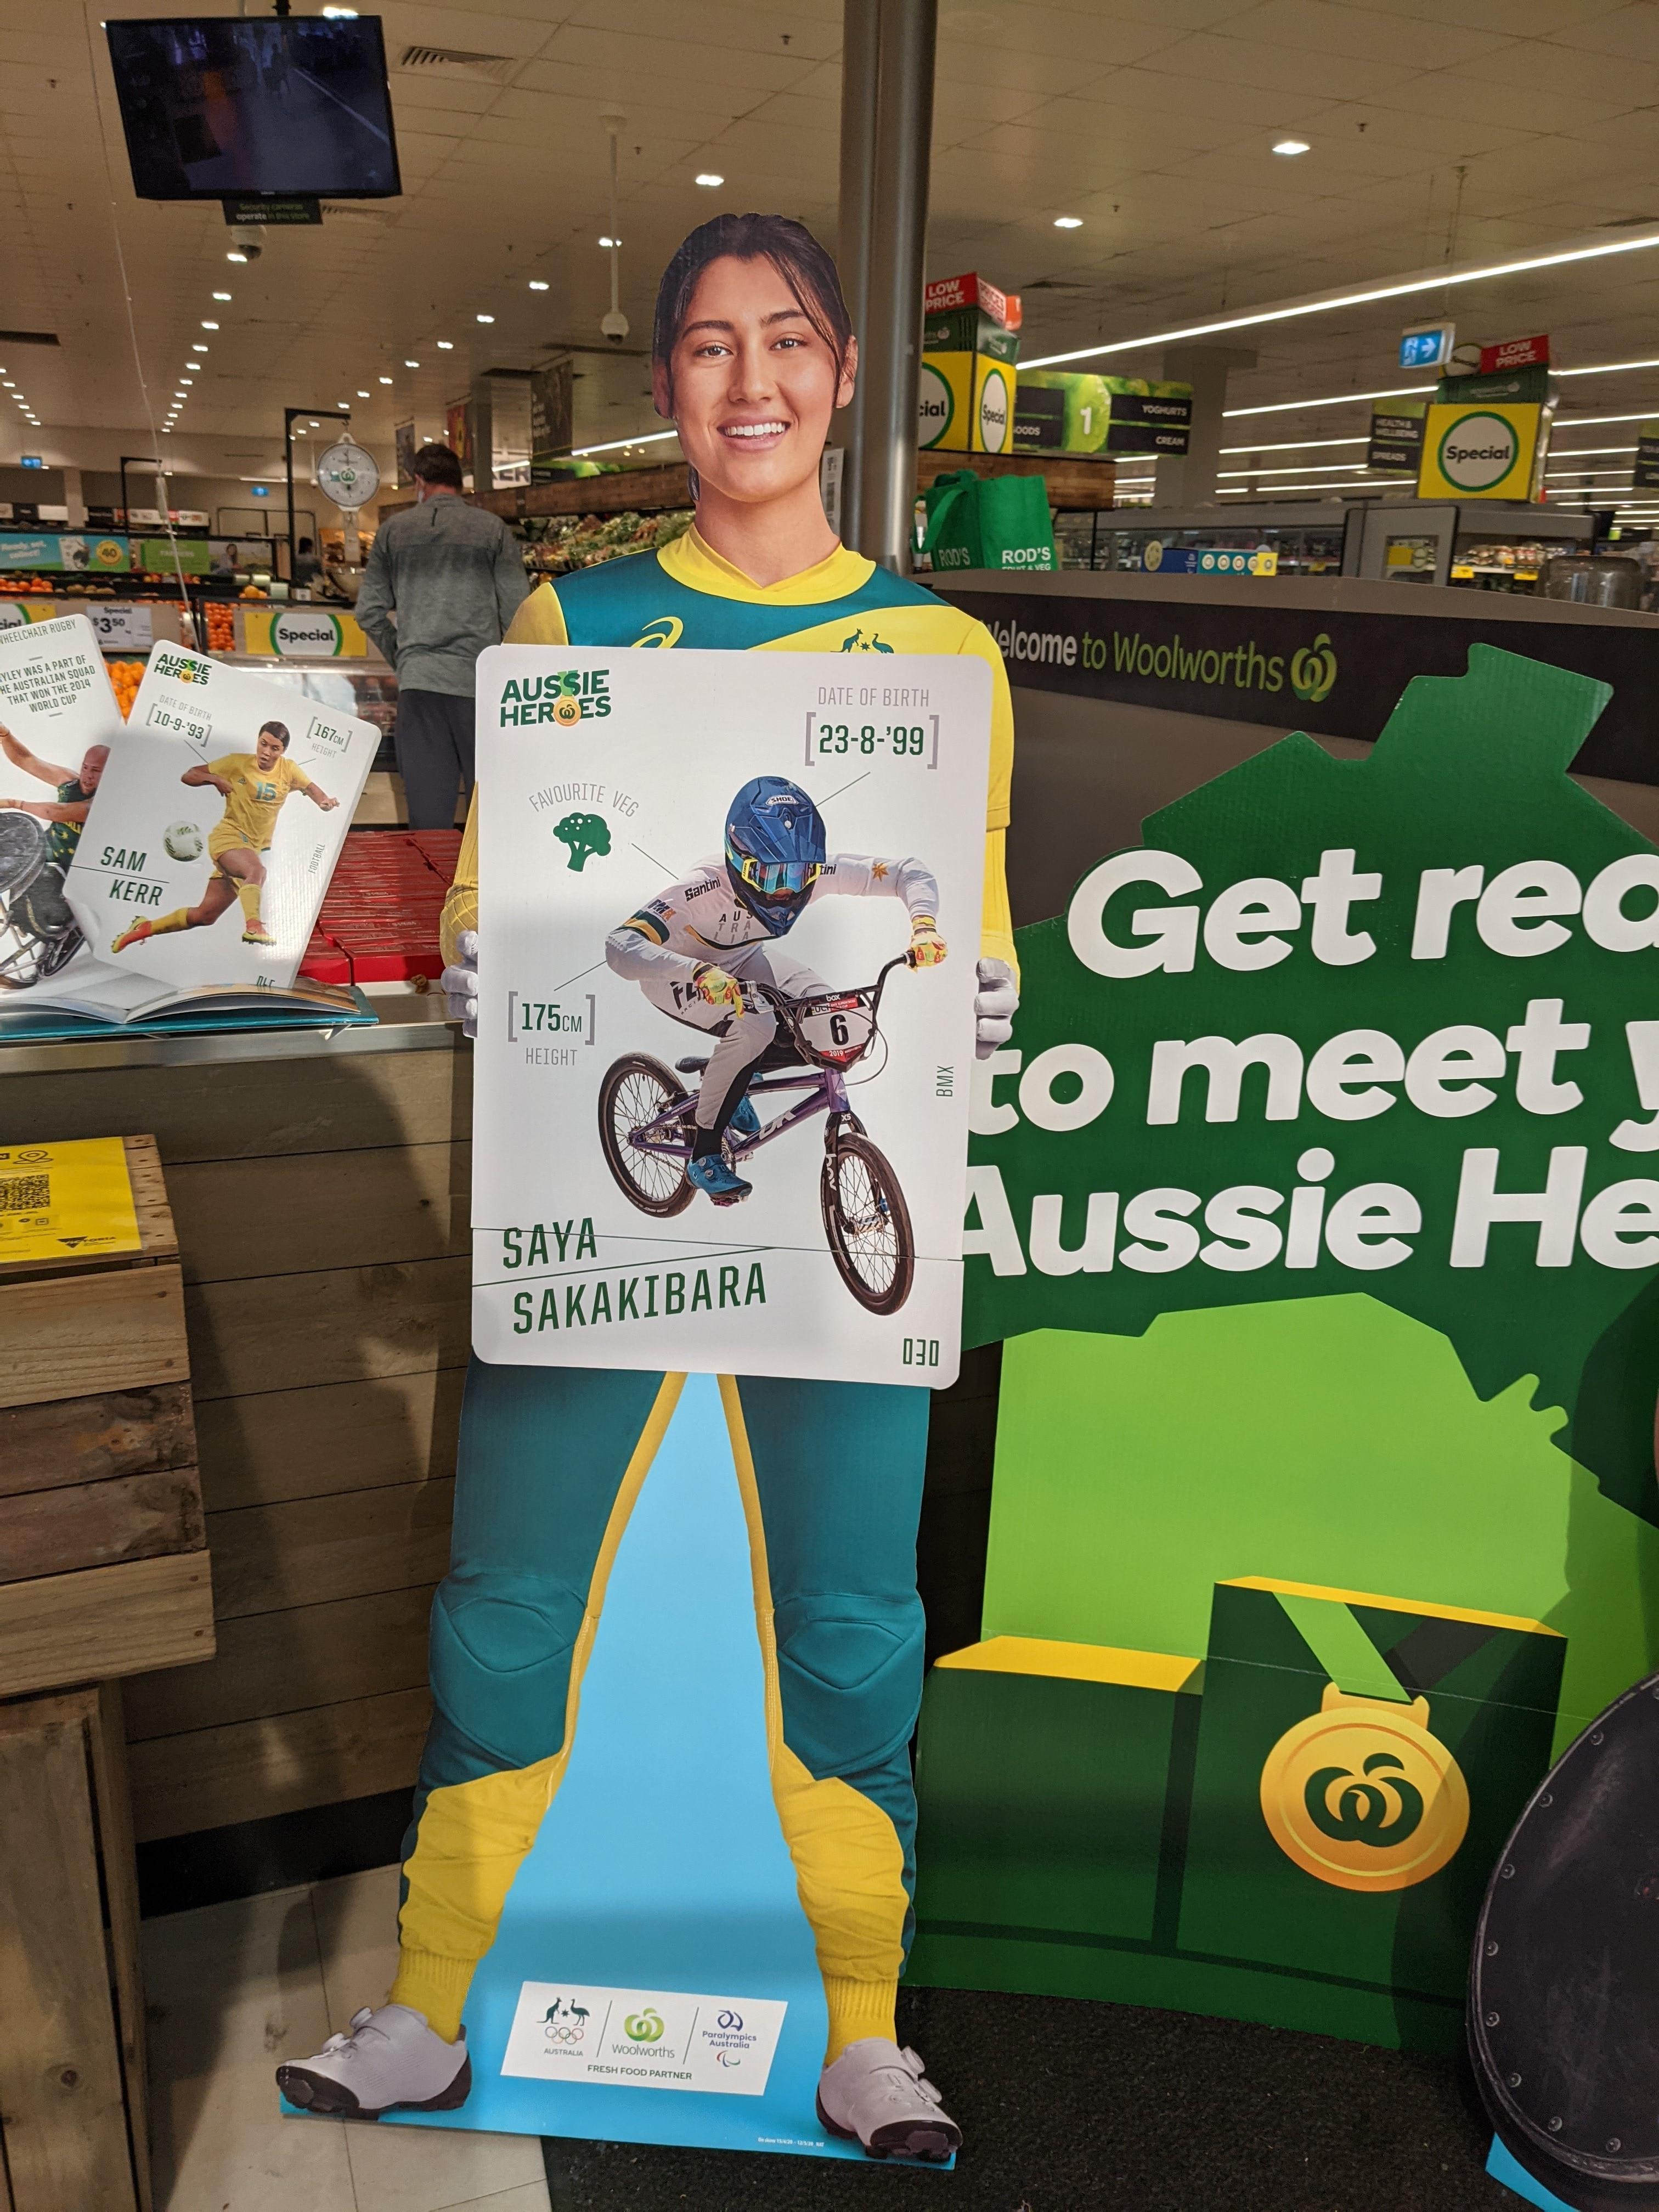 Cardboard cut-out of Saya Sakakibara, an half-Japanese BMX athlete who represents Australia for the Tokyo Olympics 2020.